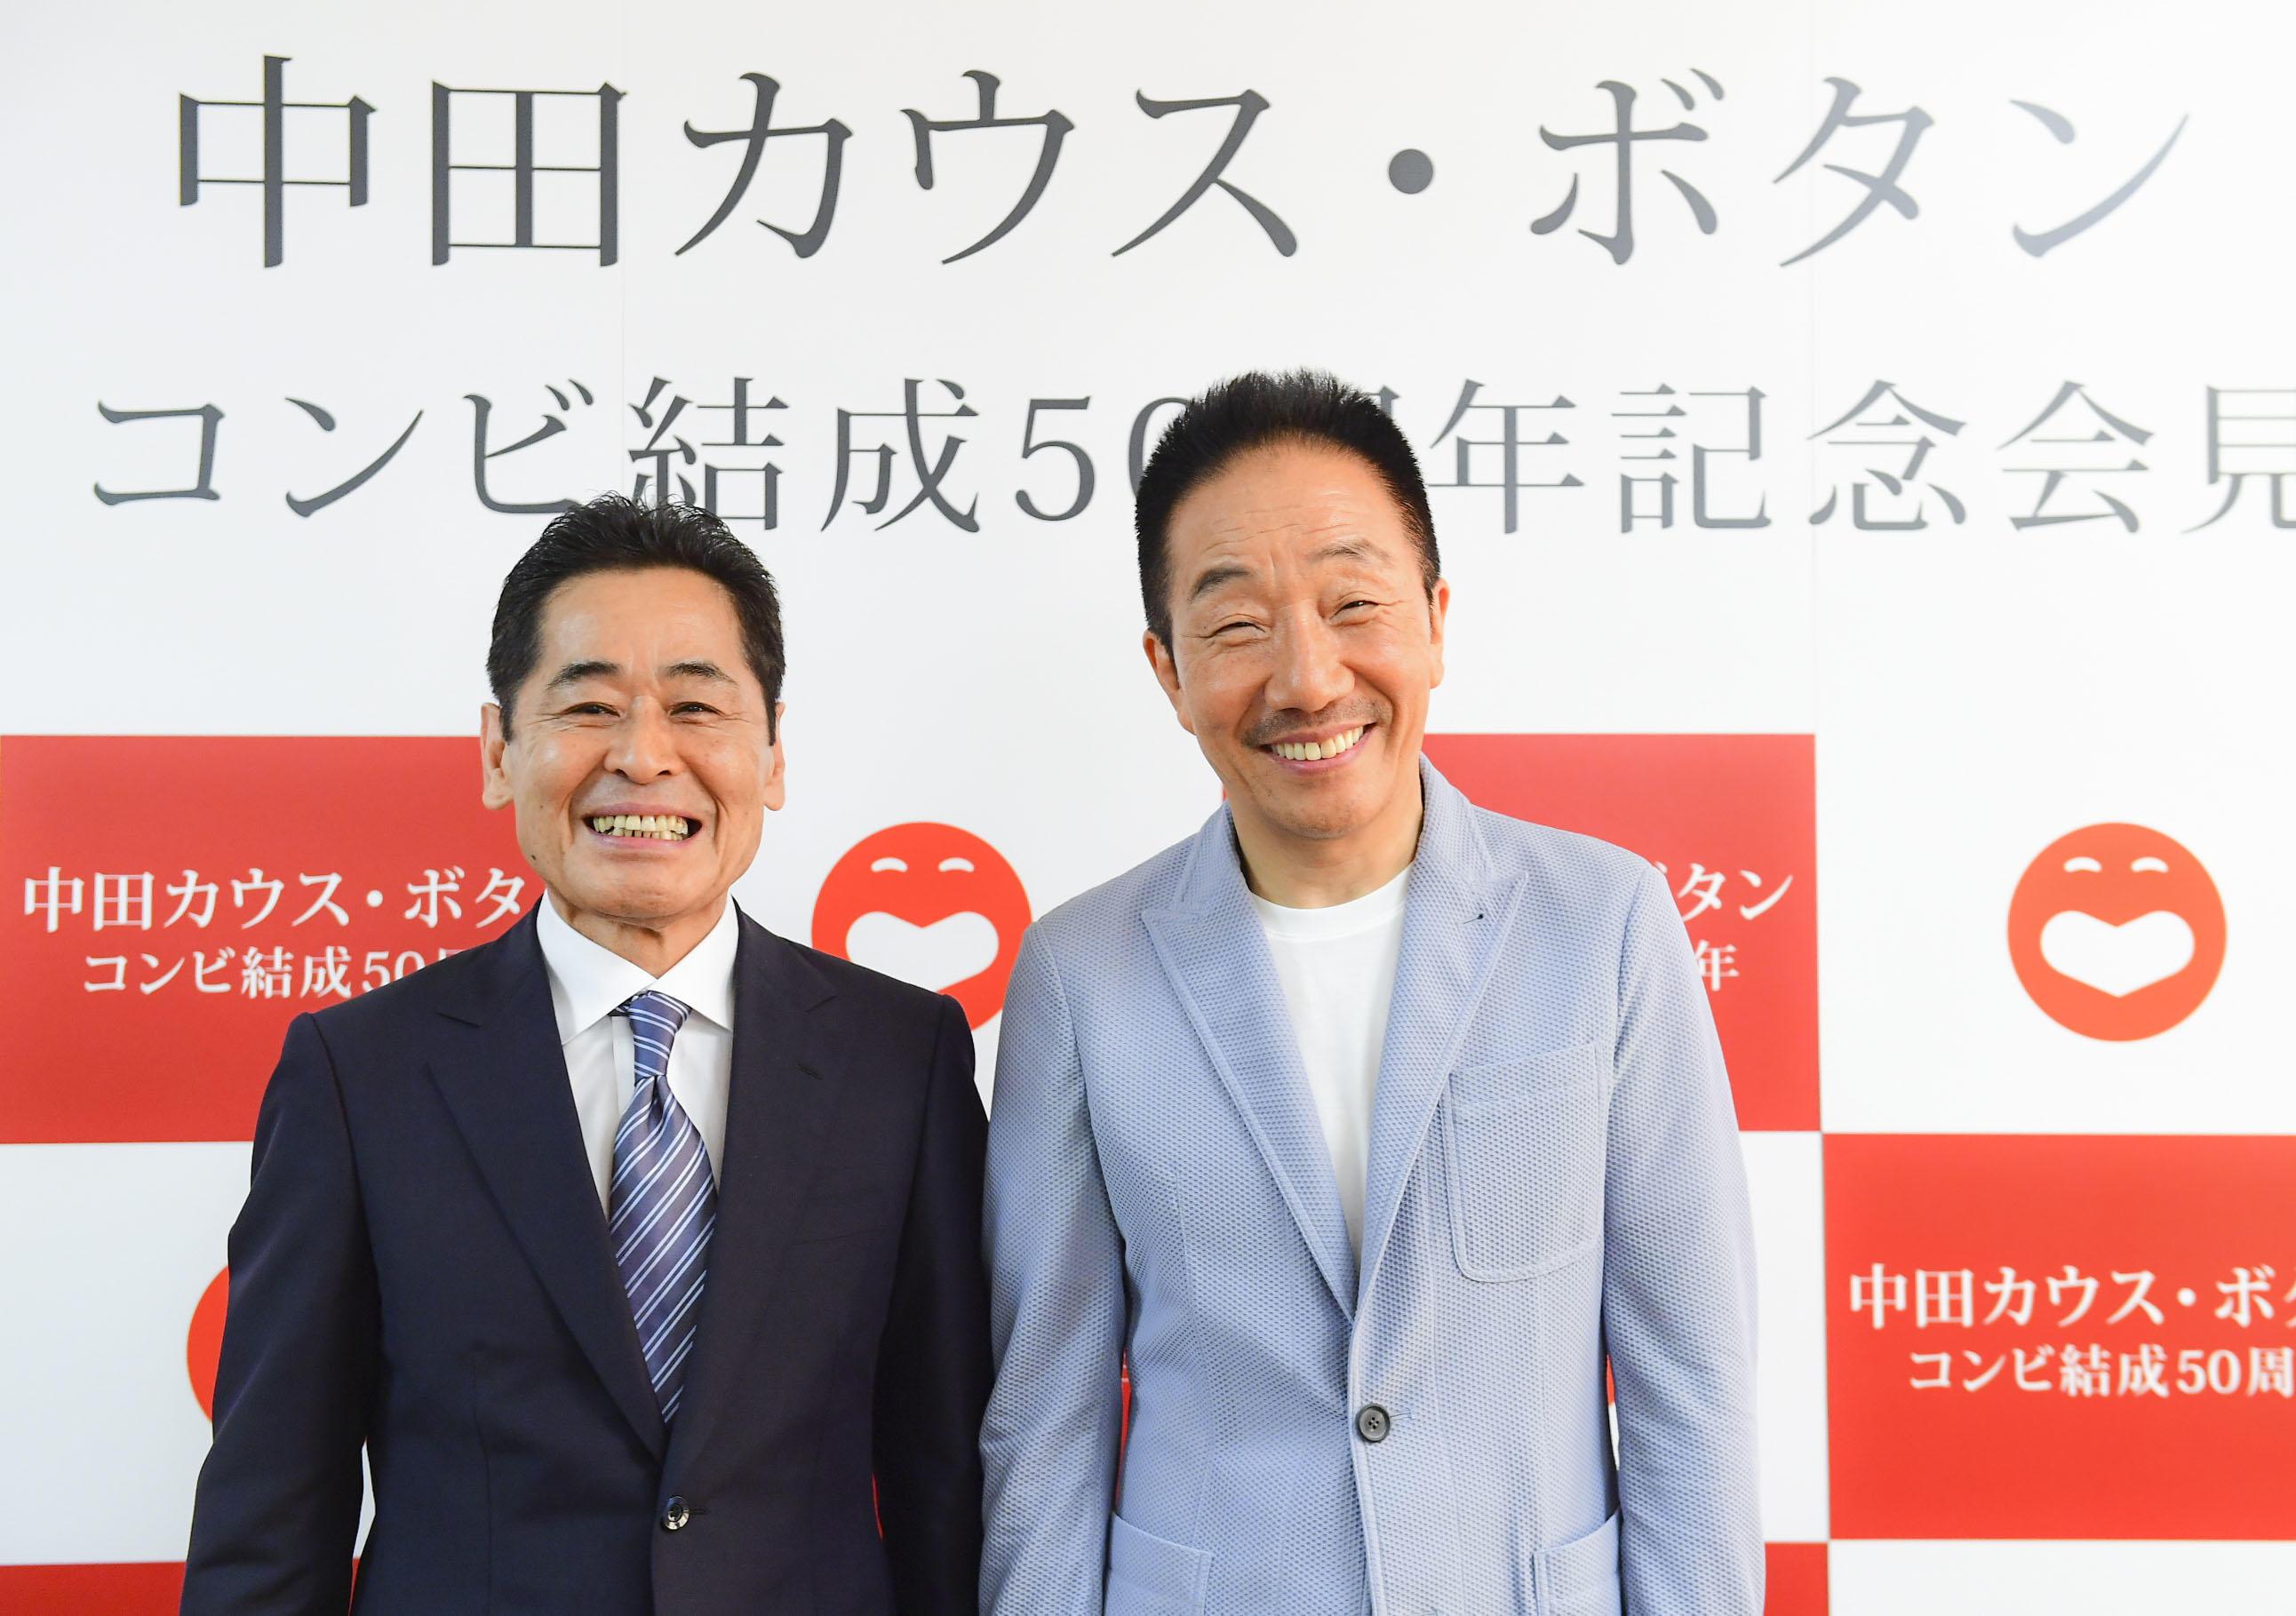 http://news.yoshimoto.co.jp/20170810222819-0fc977ec881e6e7465da3f49301831c704650e5c.jpg